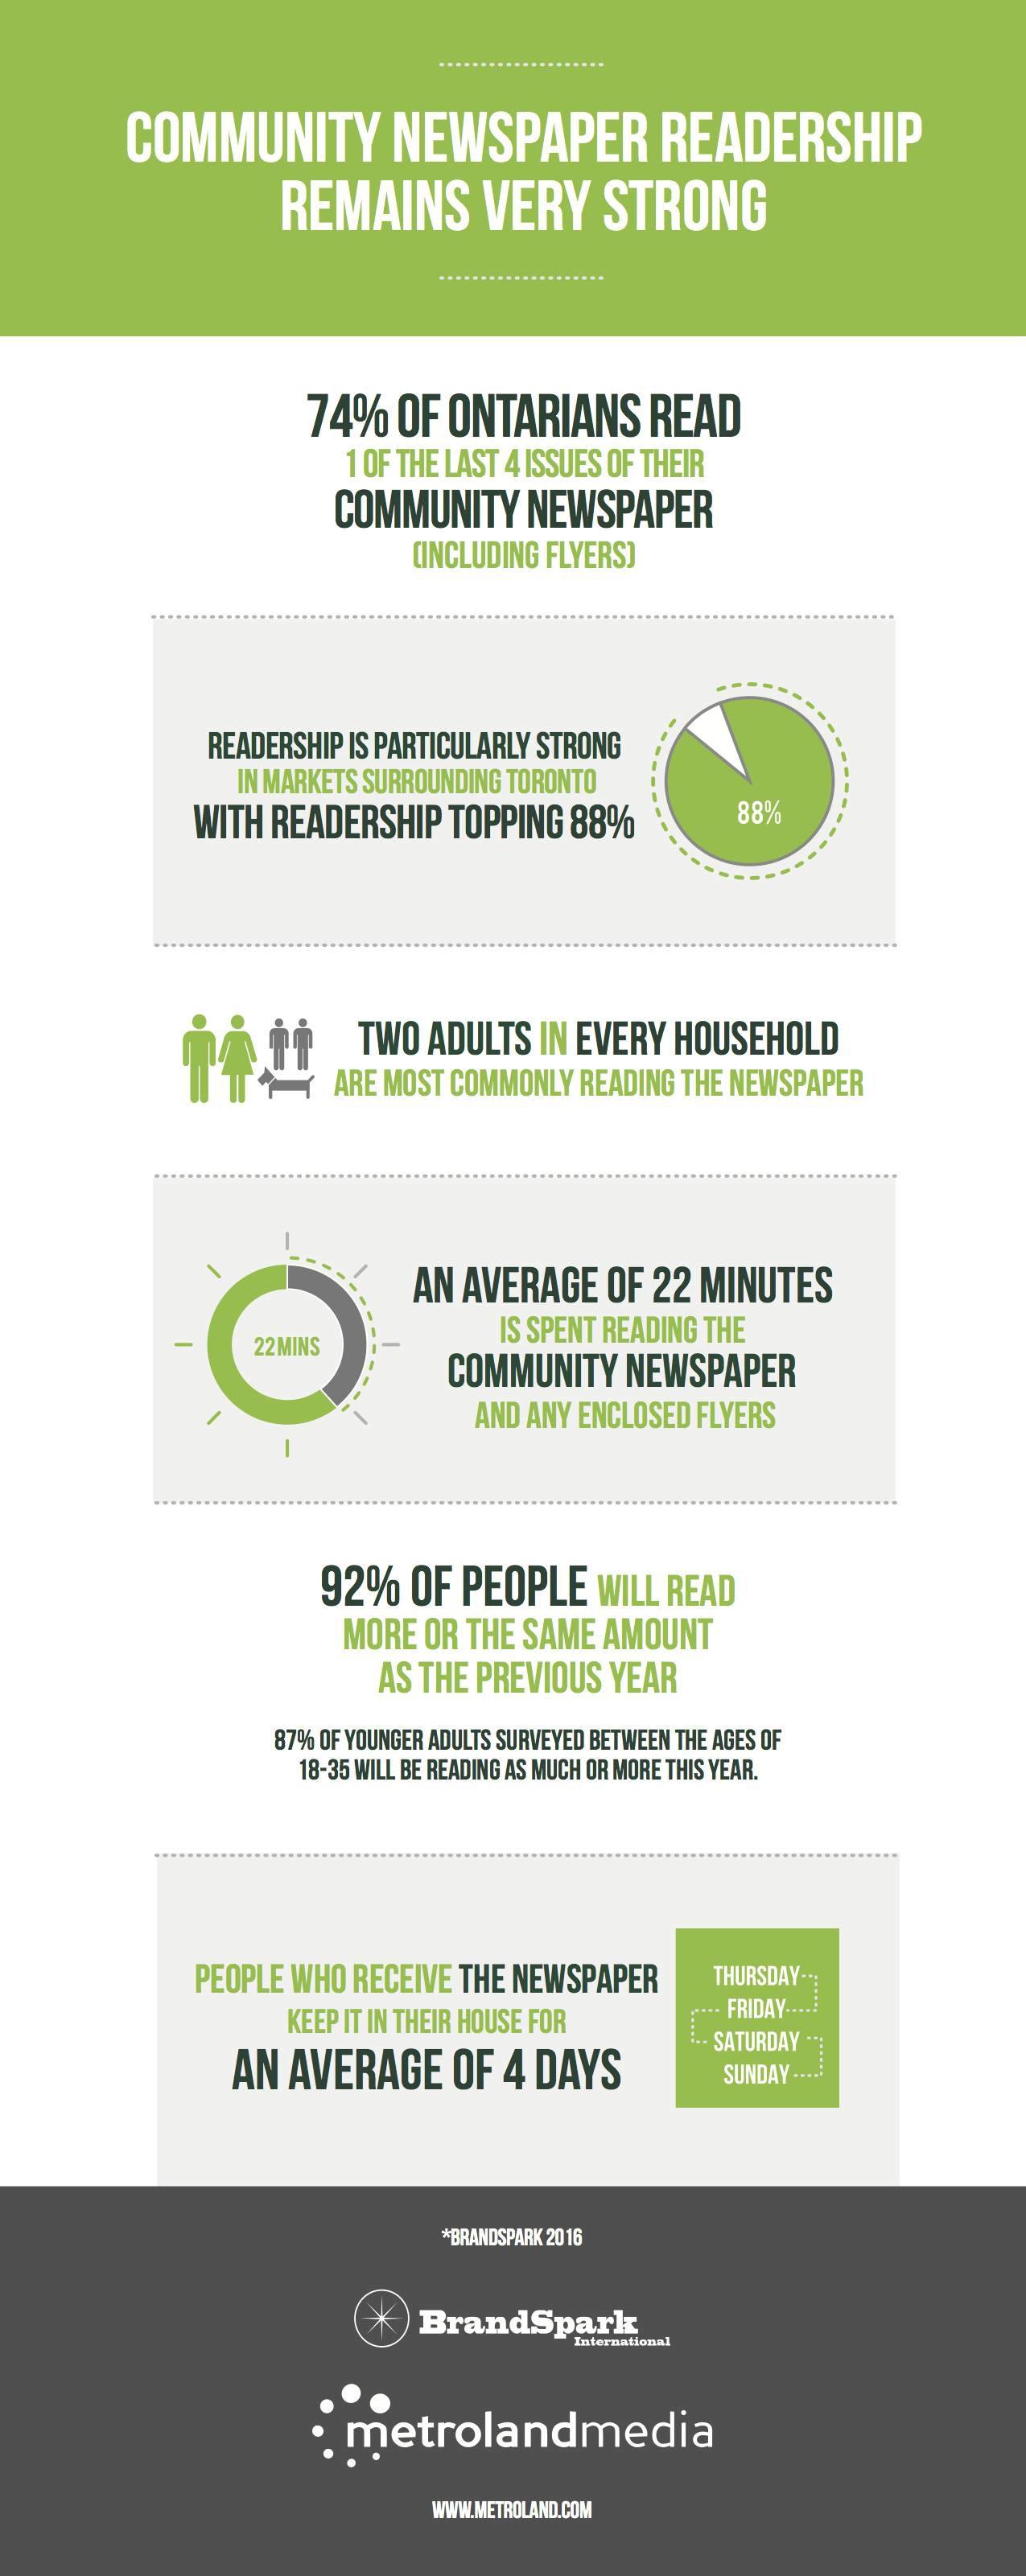 community_newspaper_infographic.jpg